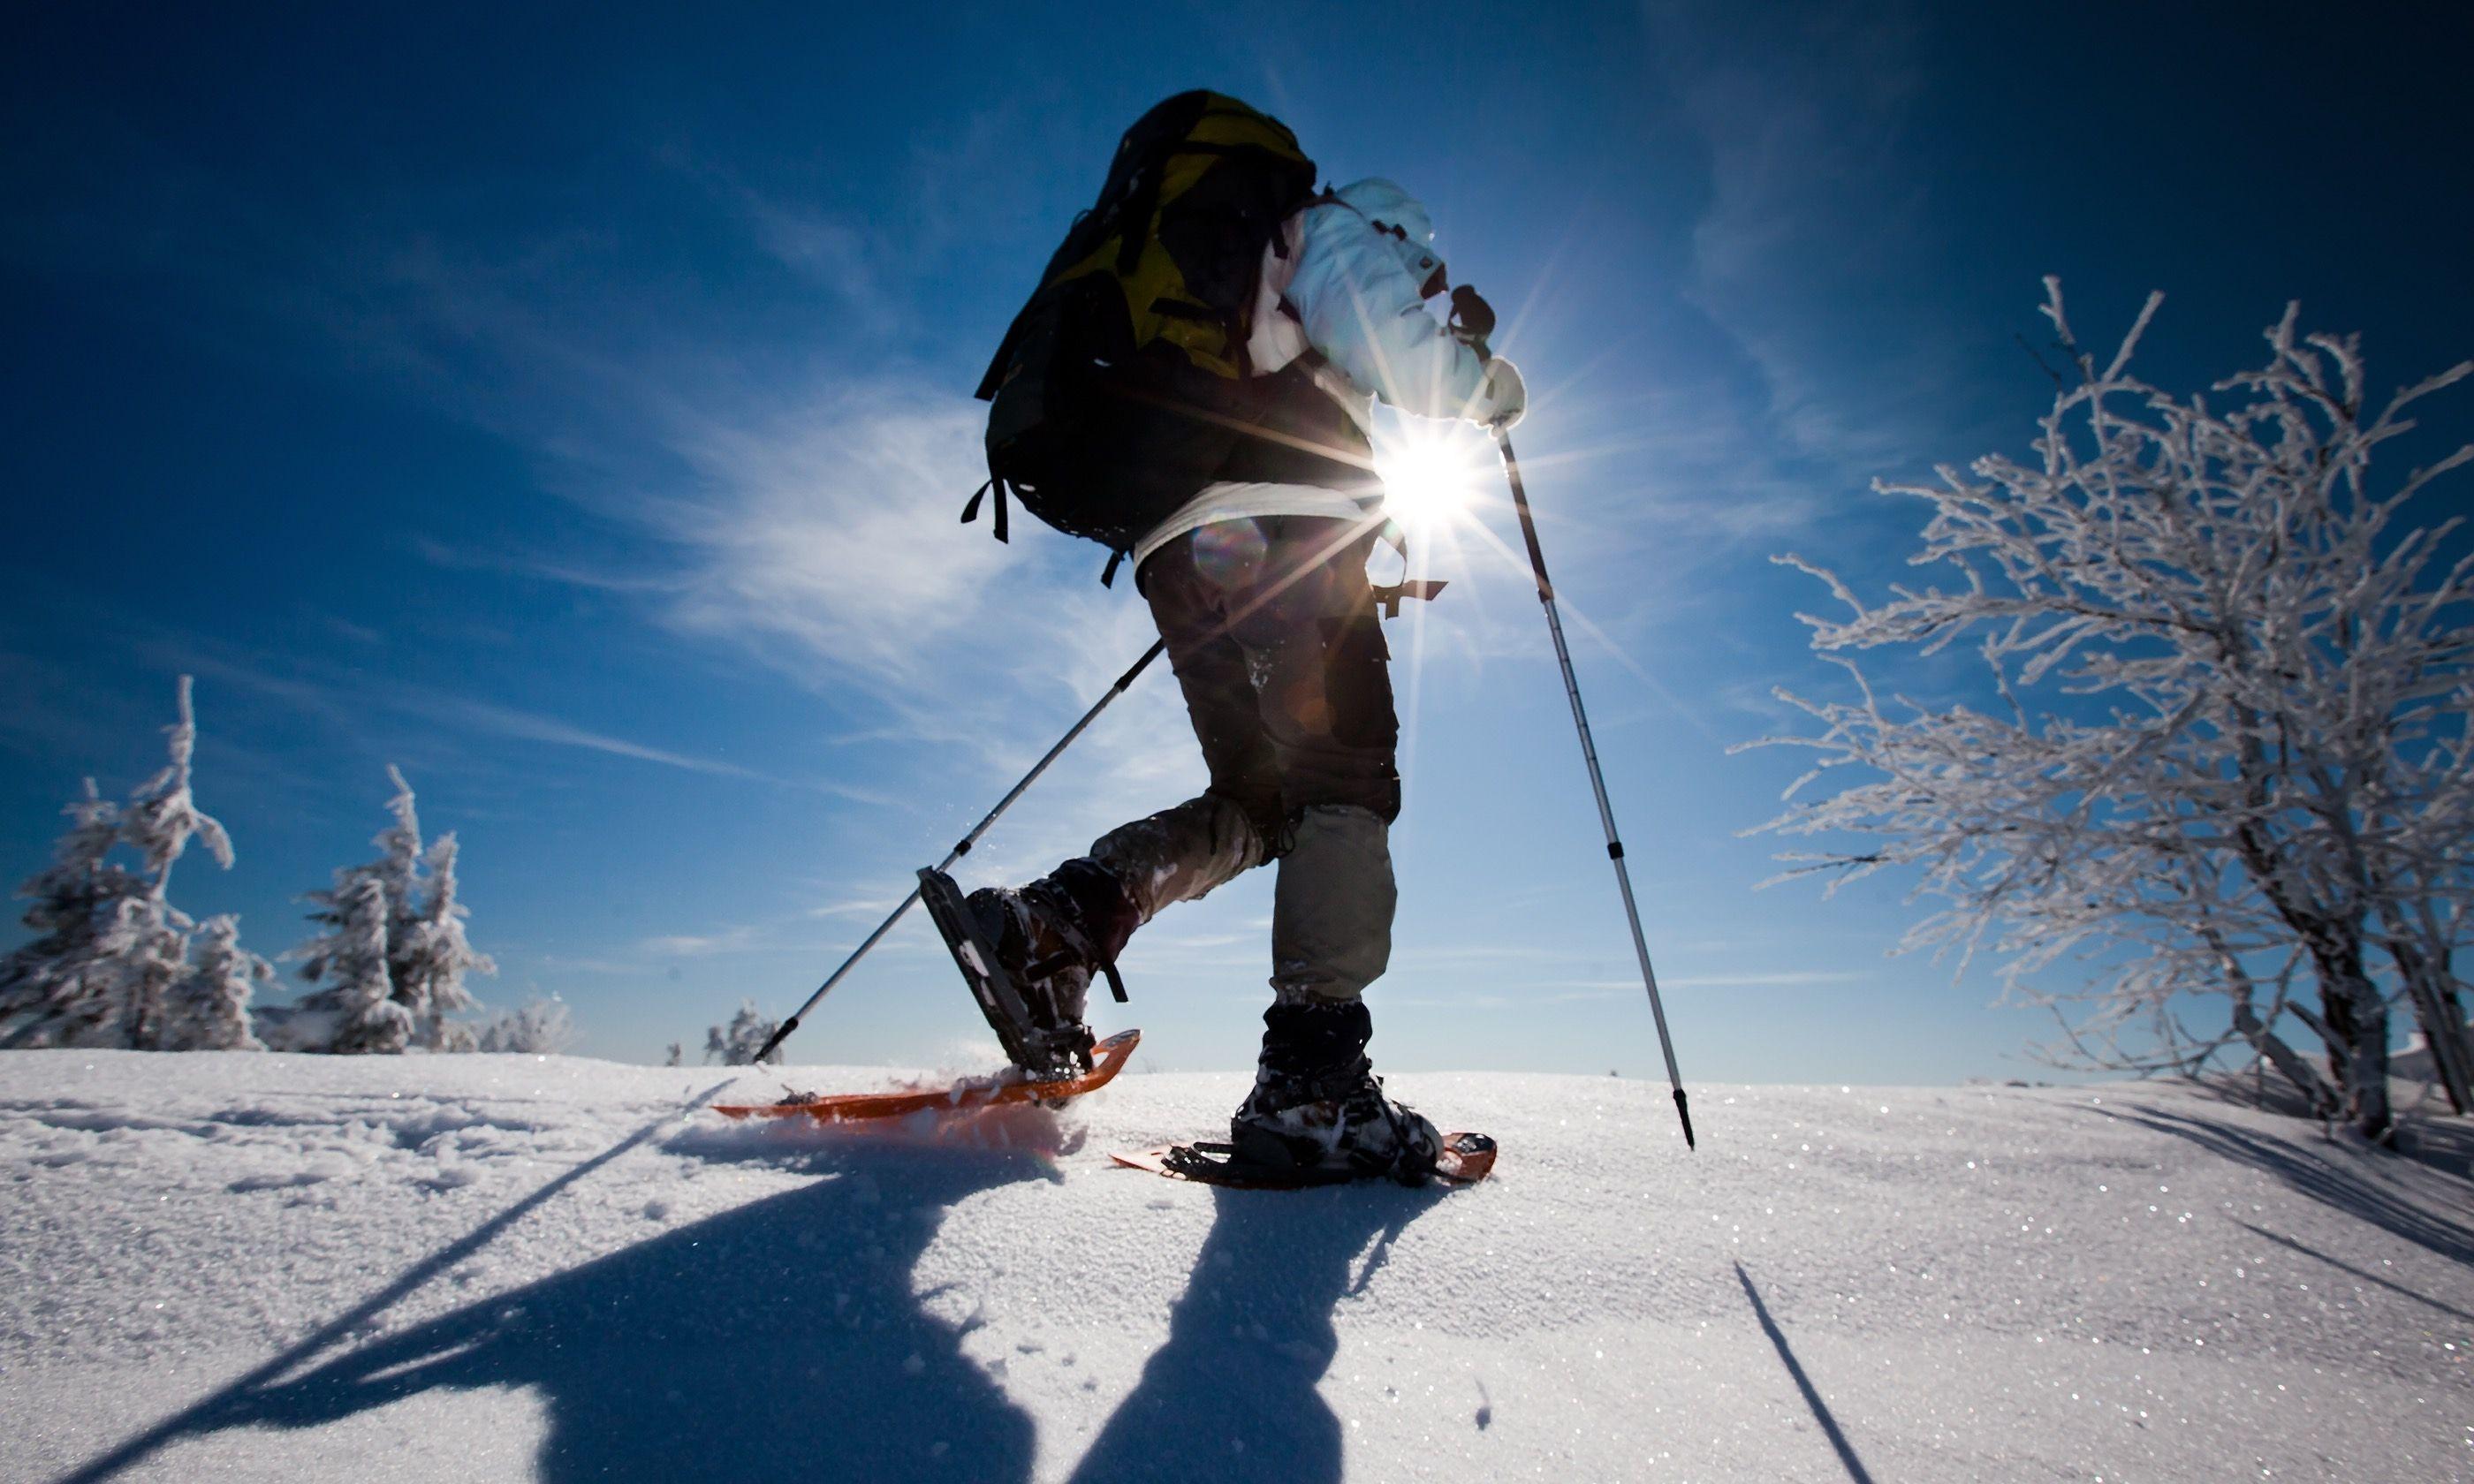 Sunburst on the snow (Shutterstock.com)